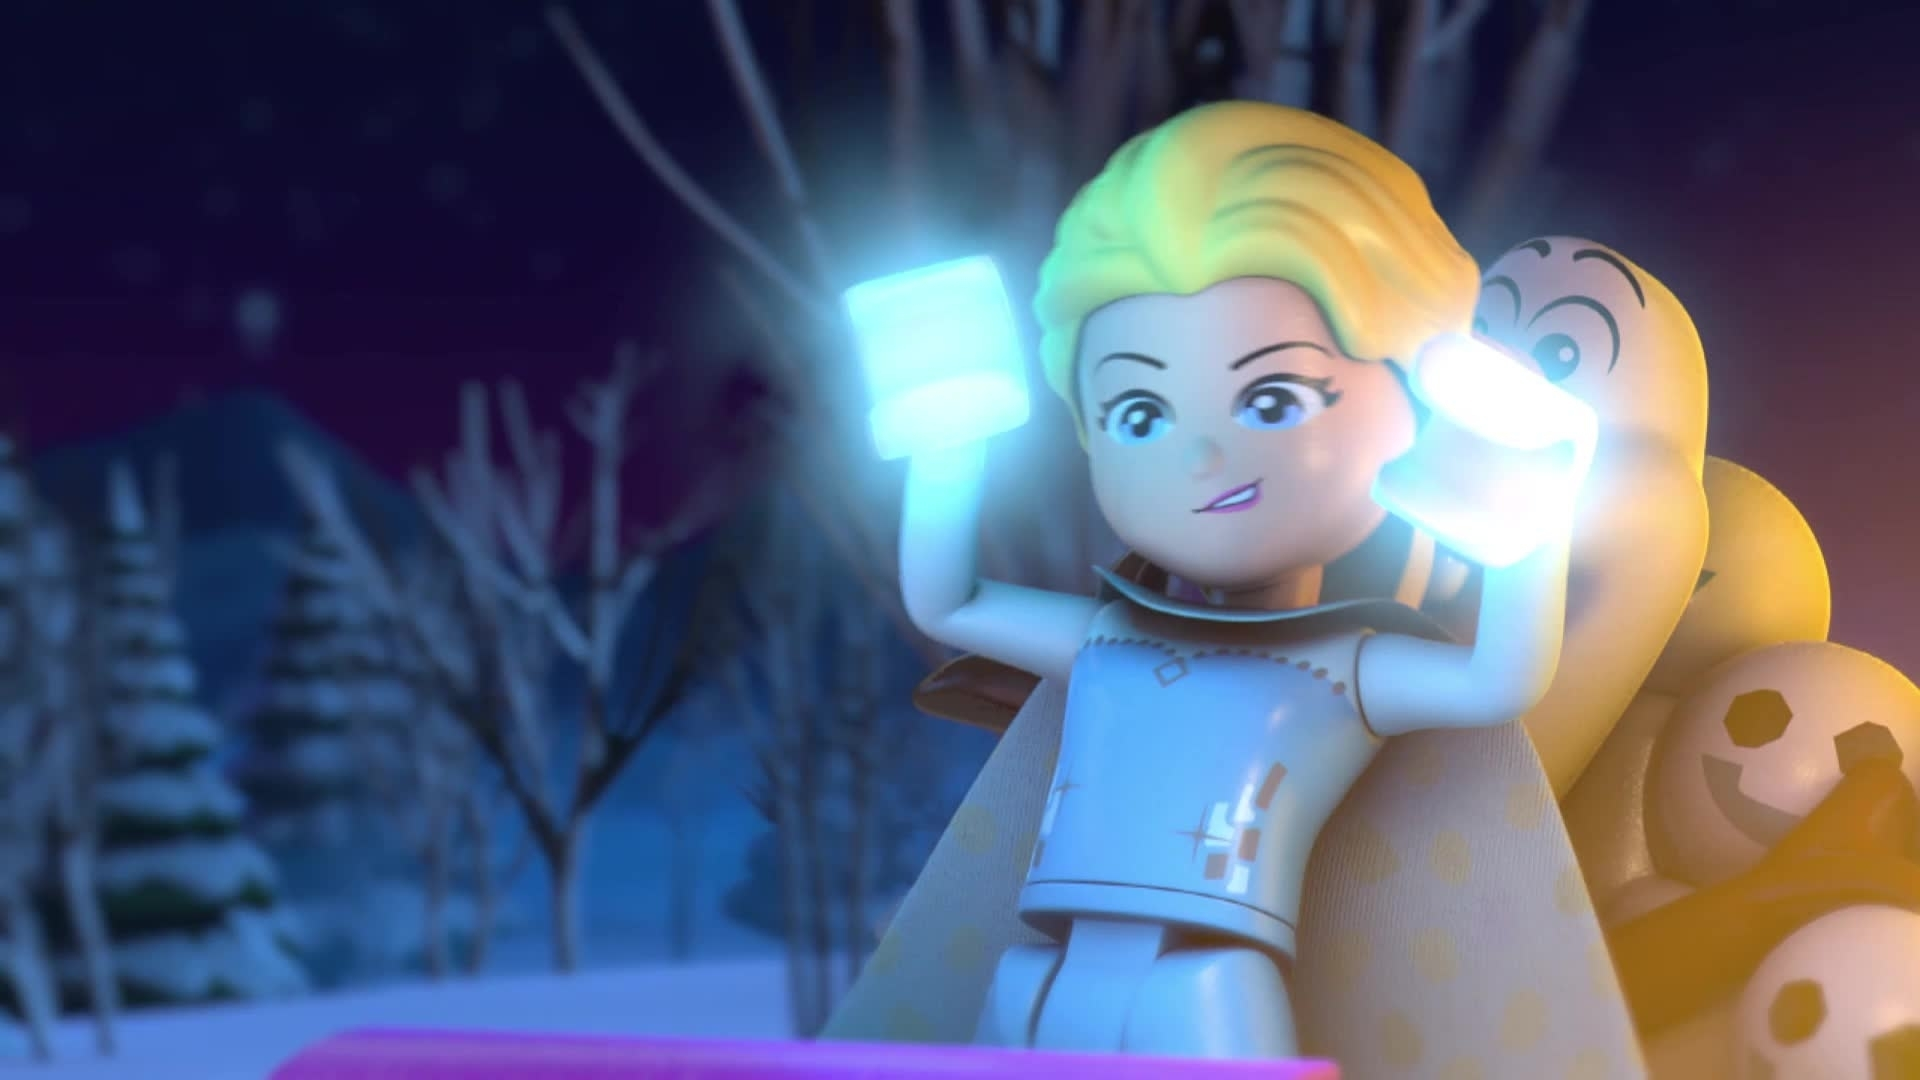 Frozen Luces de Invierno - teaser